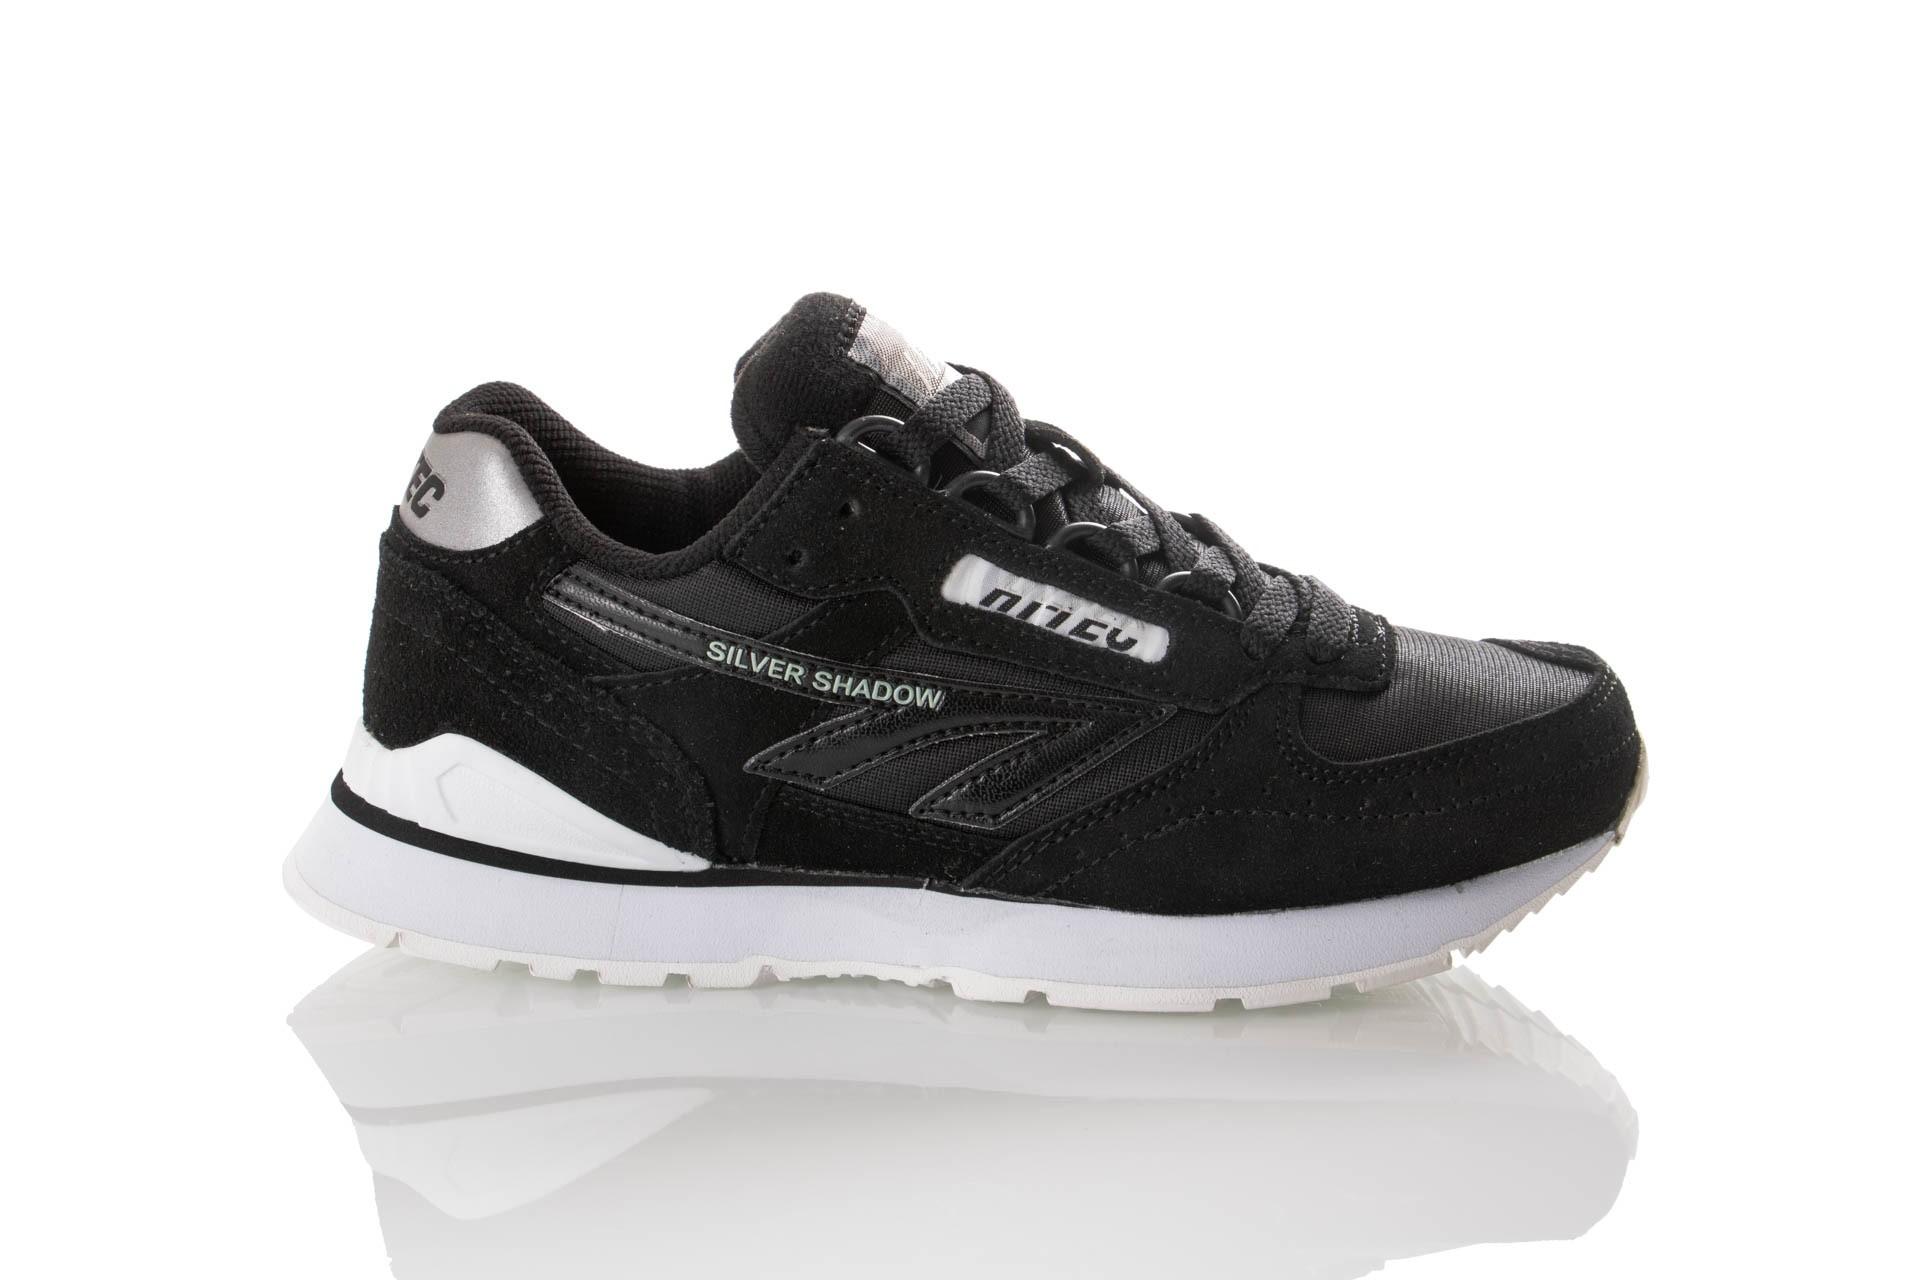 Foto van Hi-Tec SILVER SHADOW O006911 / 021 Sneakers Black/Cool Grey